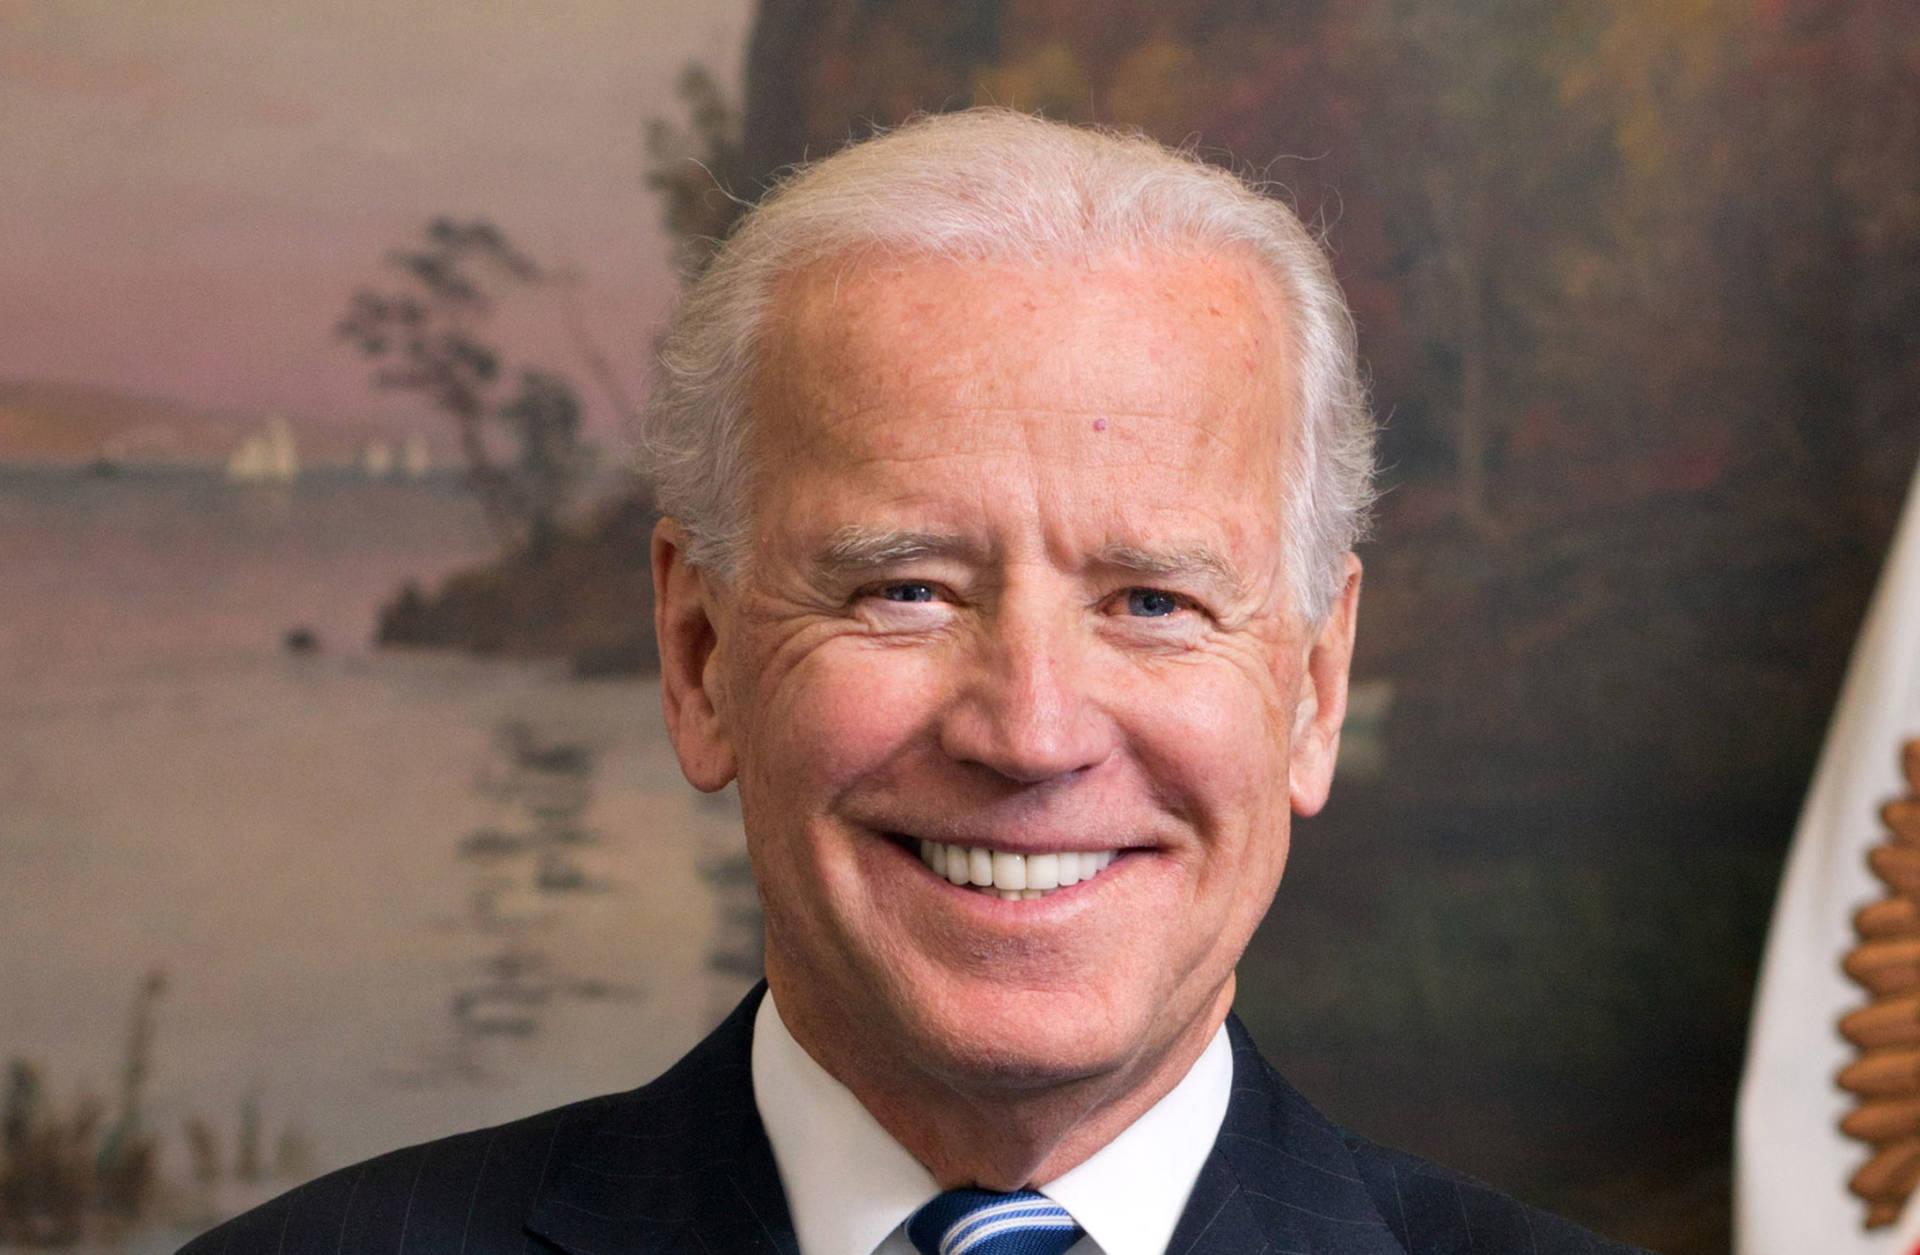 Joe Biden Kisses His Granddaughter On The Lips and It's So Creepy